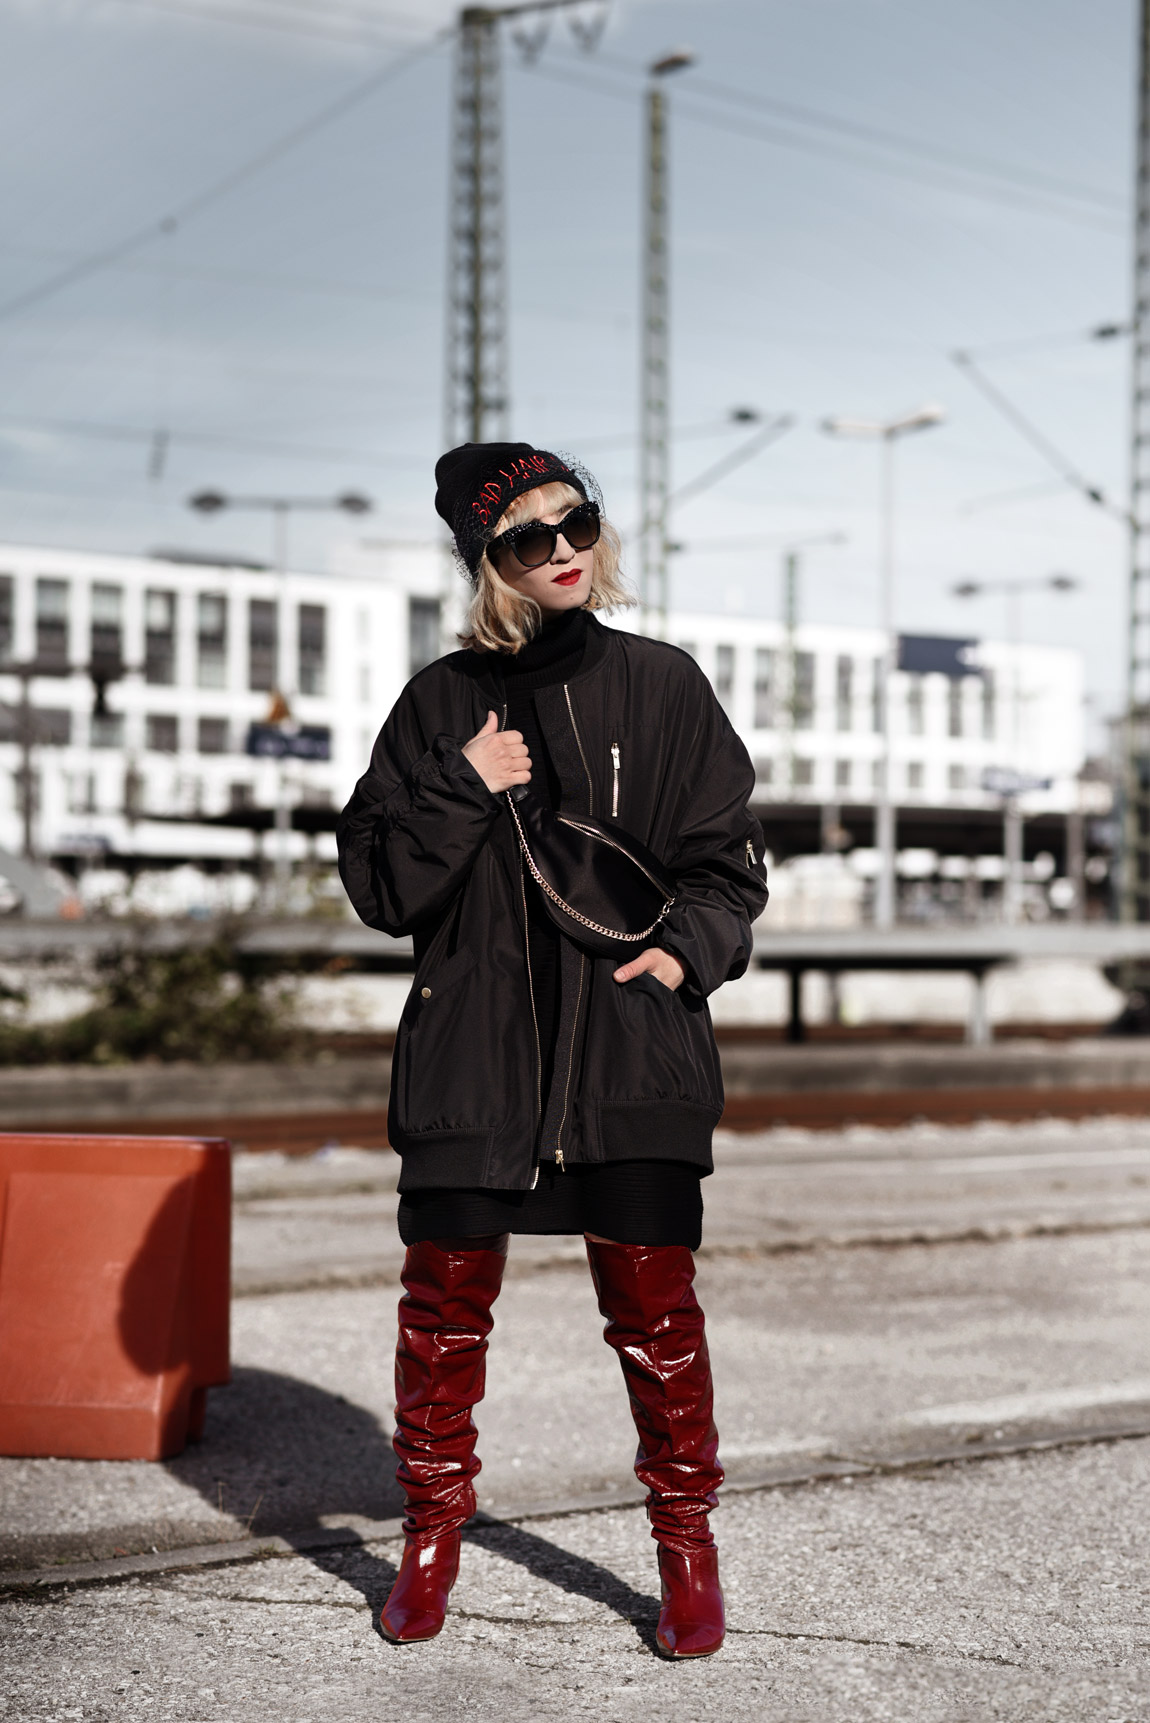 overknees, oversize, trend, rot, lackleder, fashionblog, modeblog, fashionblogger, münchen, streetstyle, bomberjacke, ootd, outfit, look, schwarz, inspiration